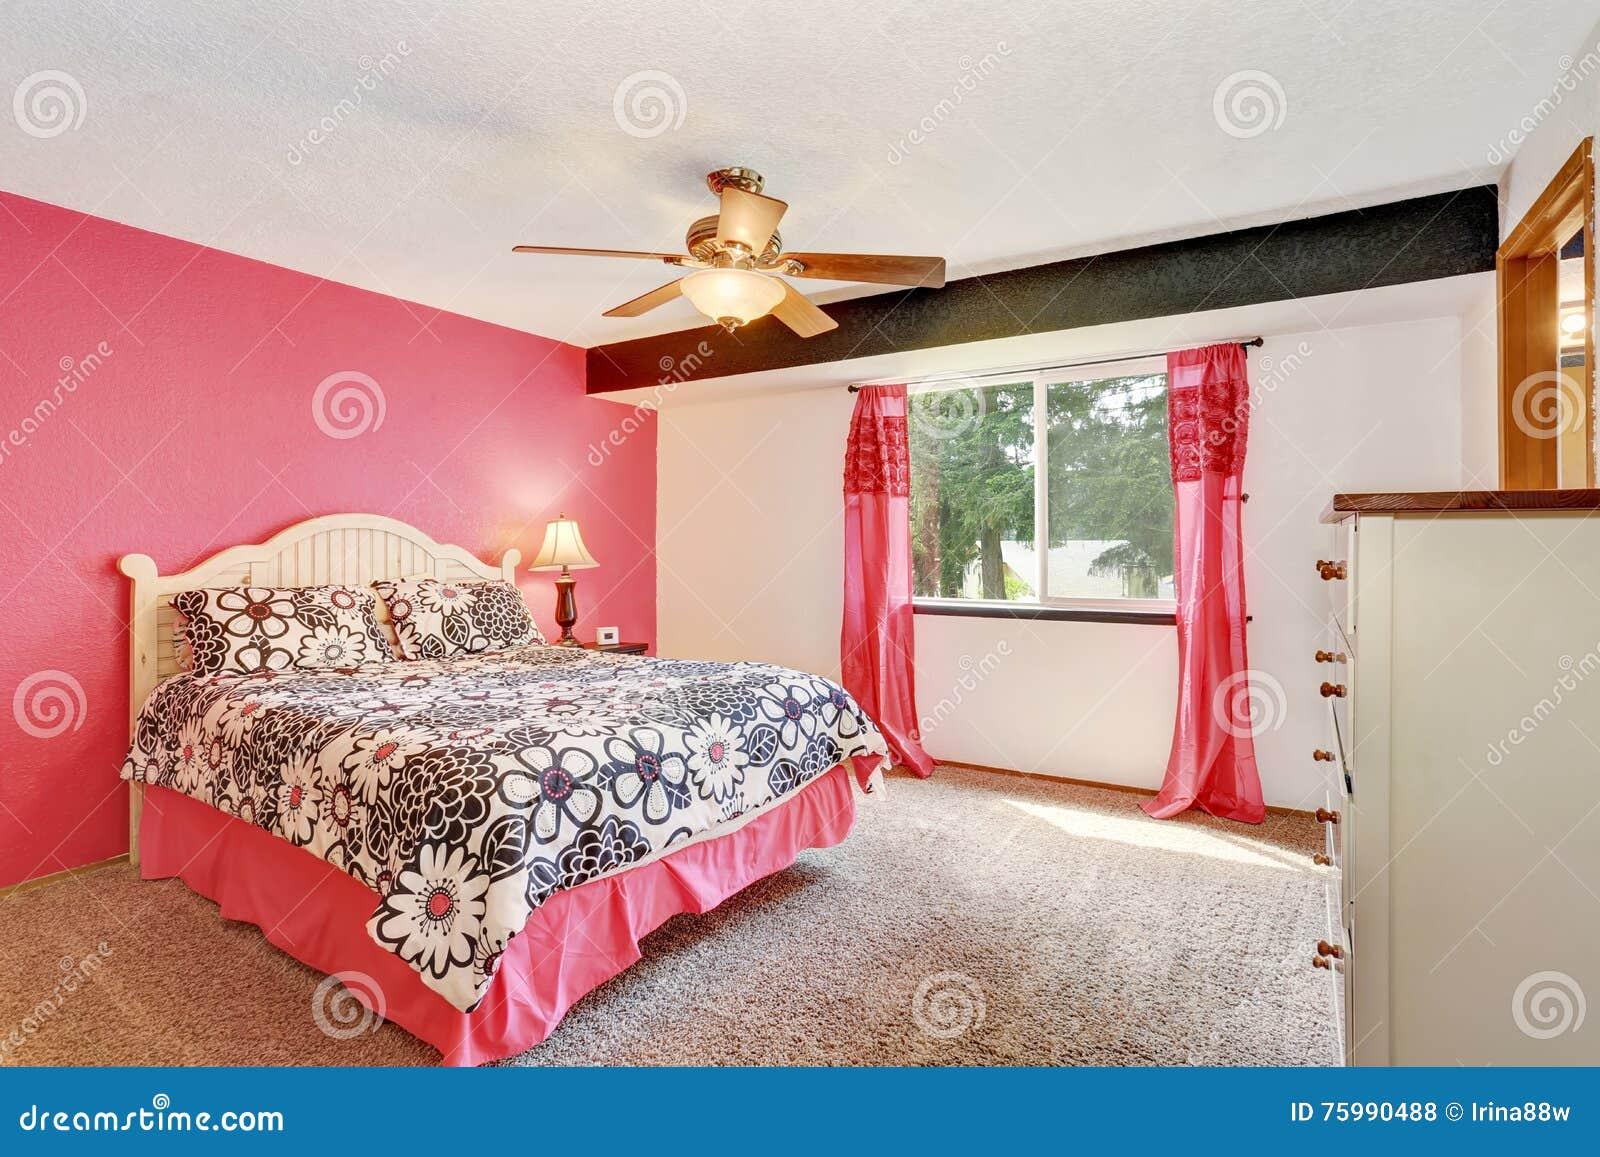 Camera Letto Rosa : Zara home catalogo camera letto rosa home arredamento